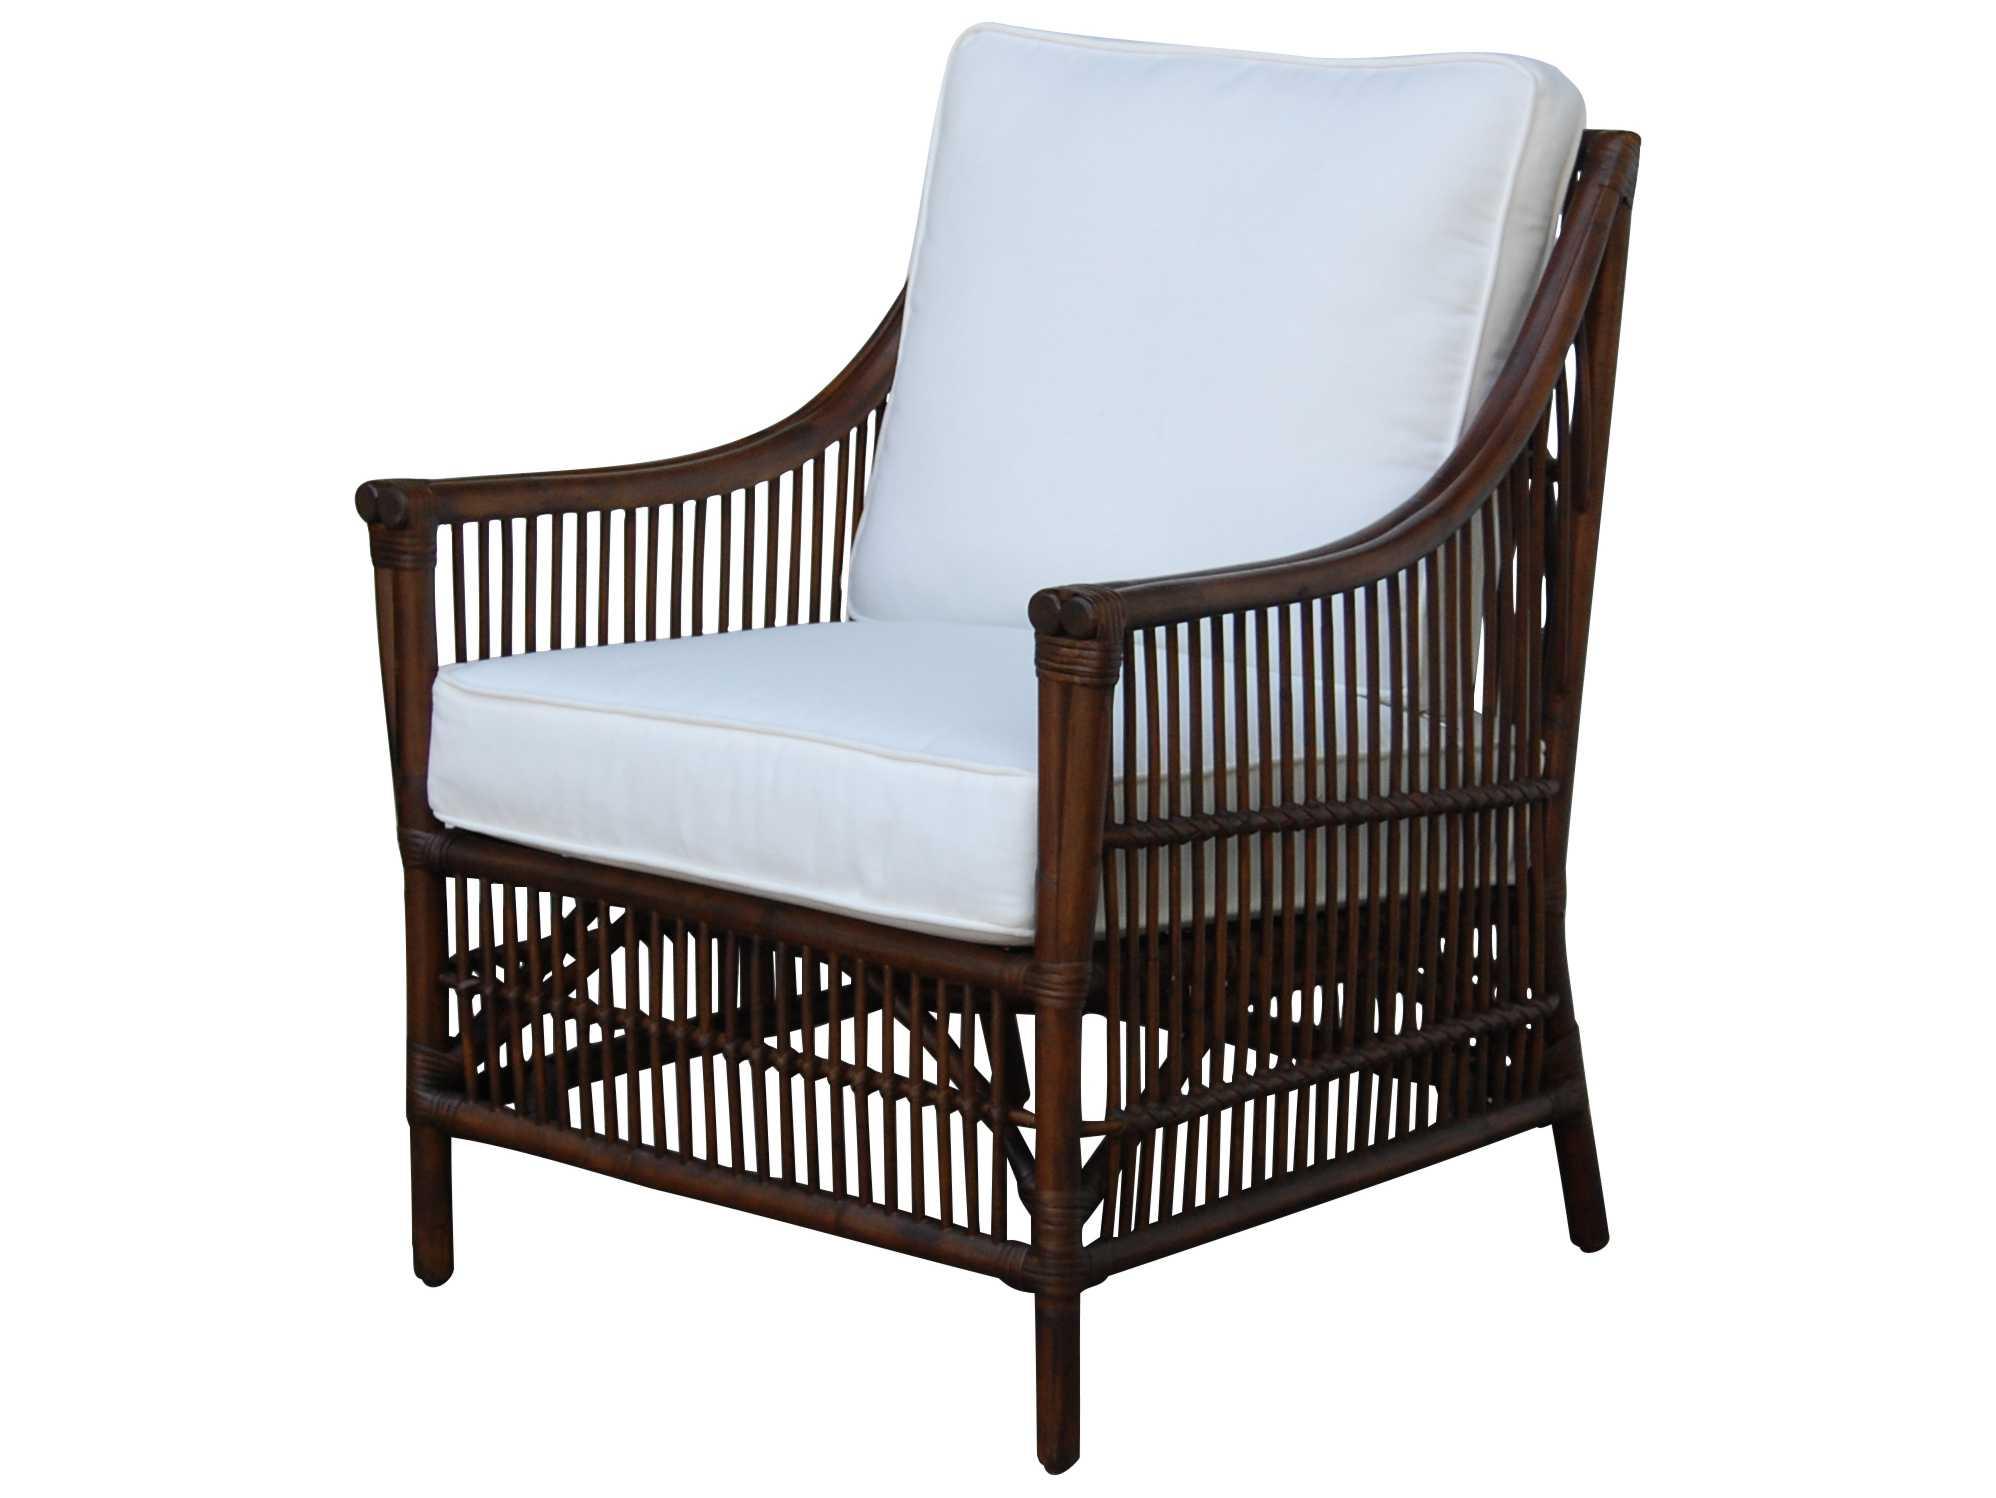 Panama Jack Bora Bora Wicker Lounge Chair